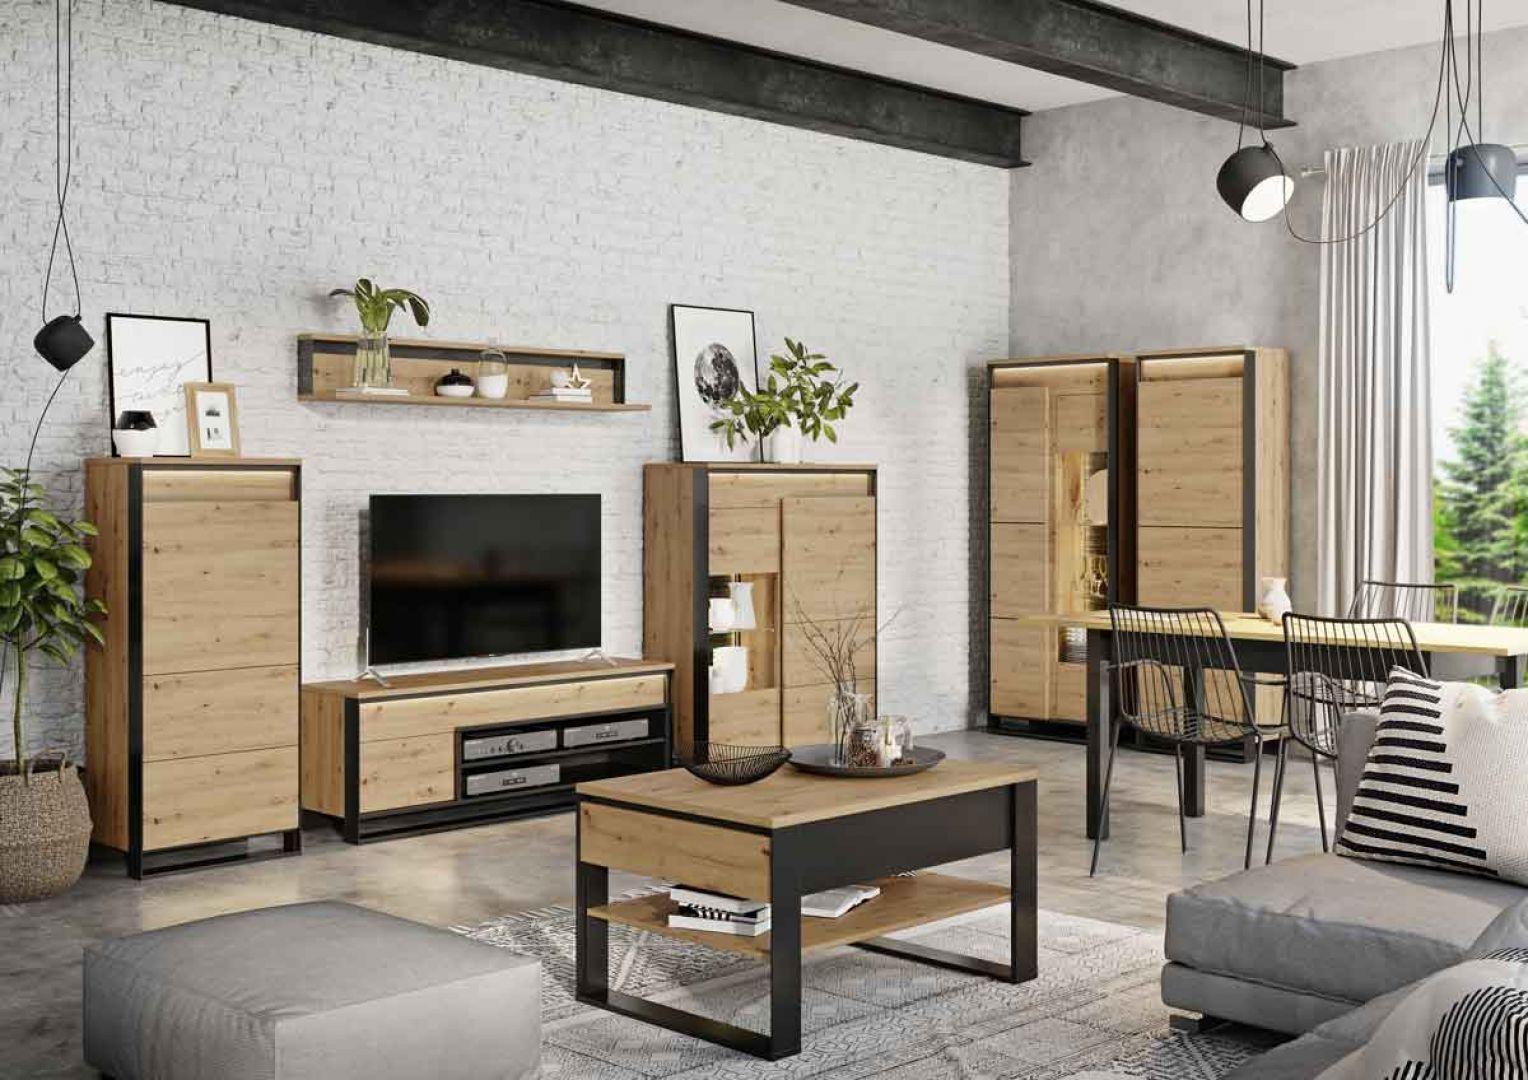 Meble do salonu z kolekcji Quant dostępne ofercie firmy Dignet Lenart. Fot. Dignet Lenart